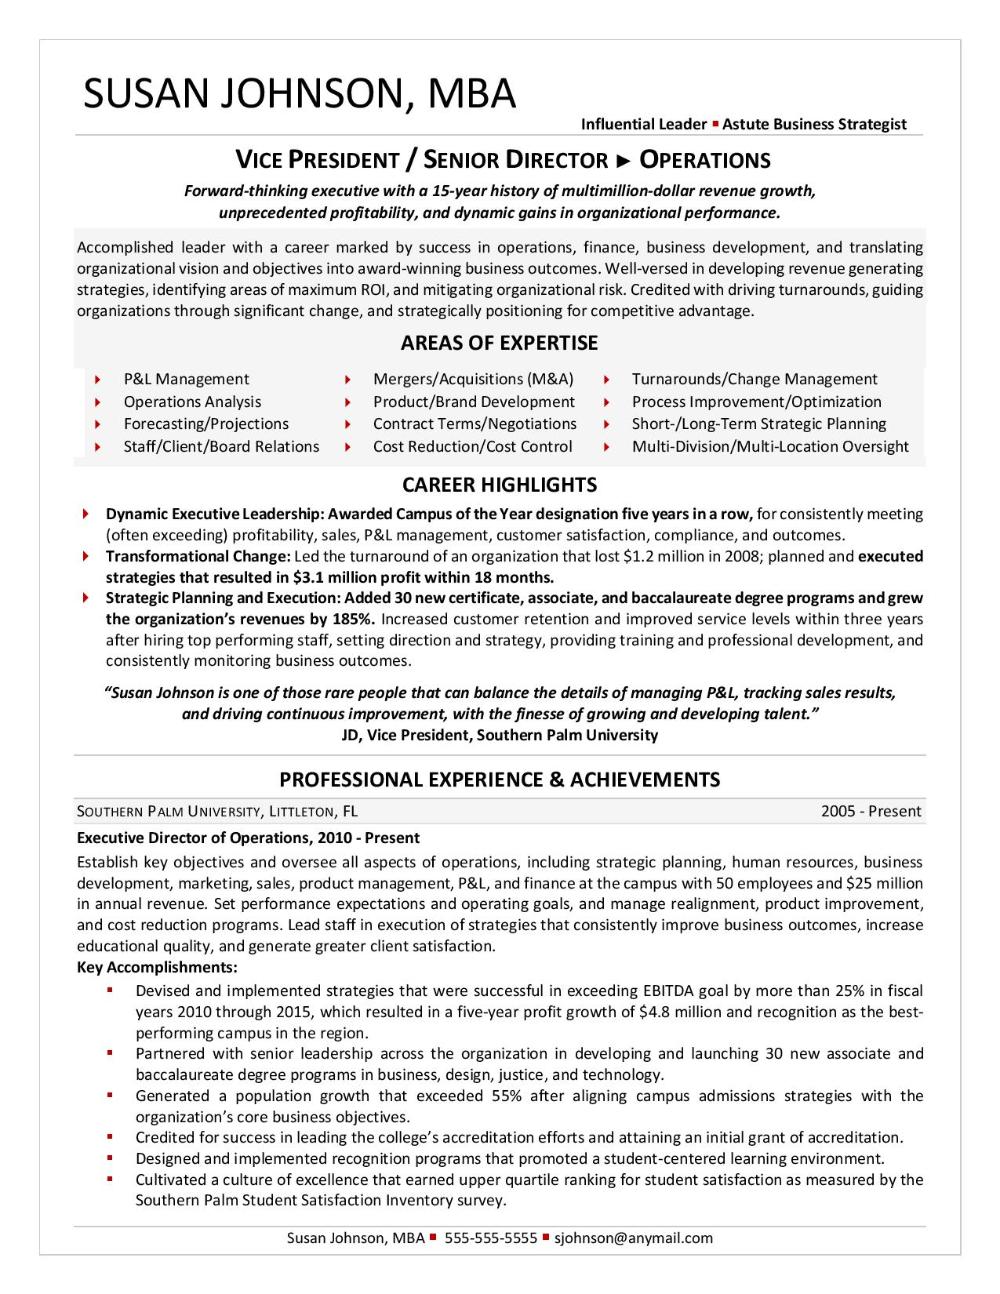 Vp Senior Director Operations Pg 1 Executive Resume Resume Services Resume